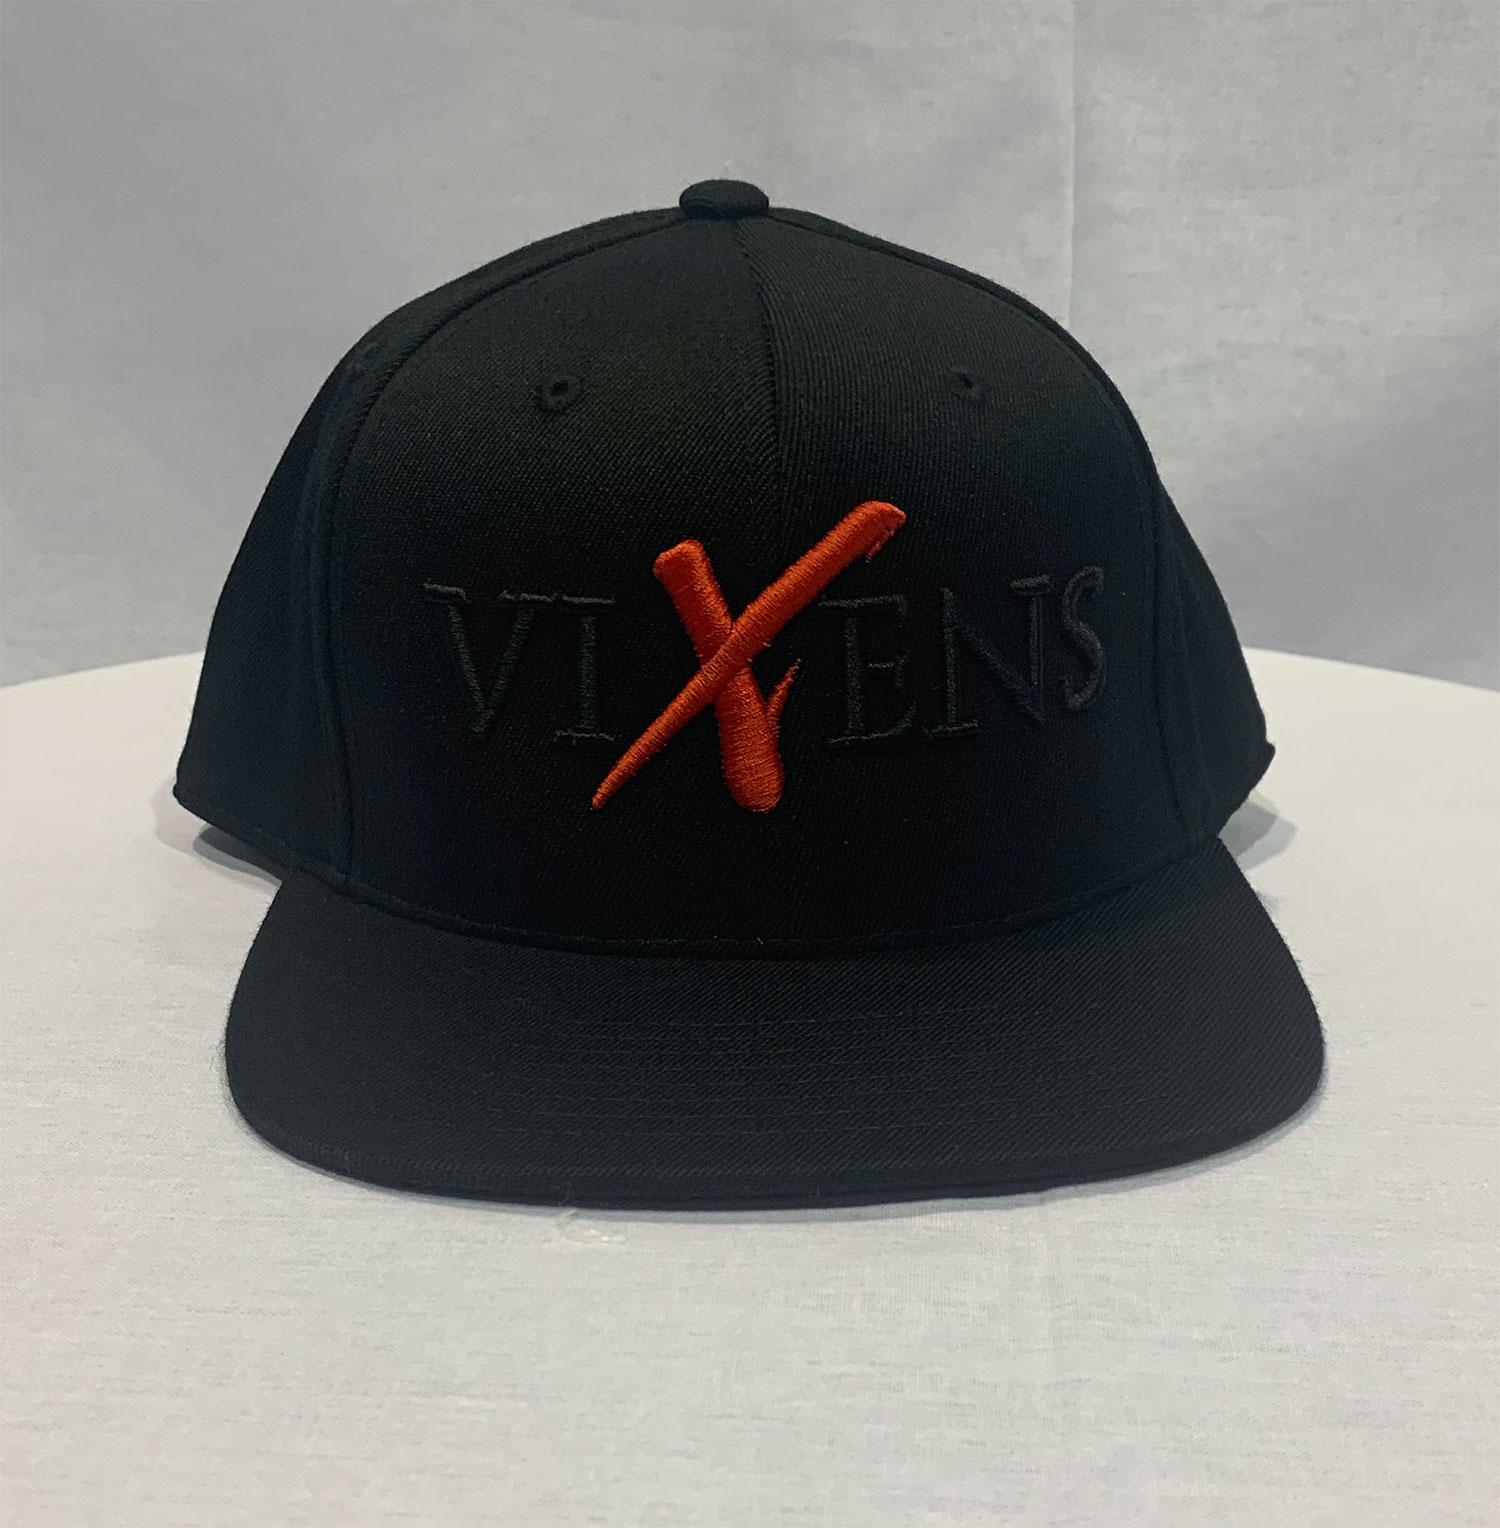 Hat (Black Red X)